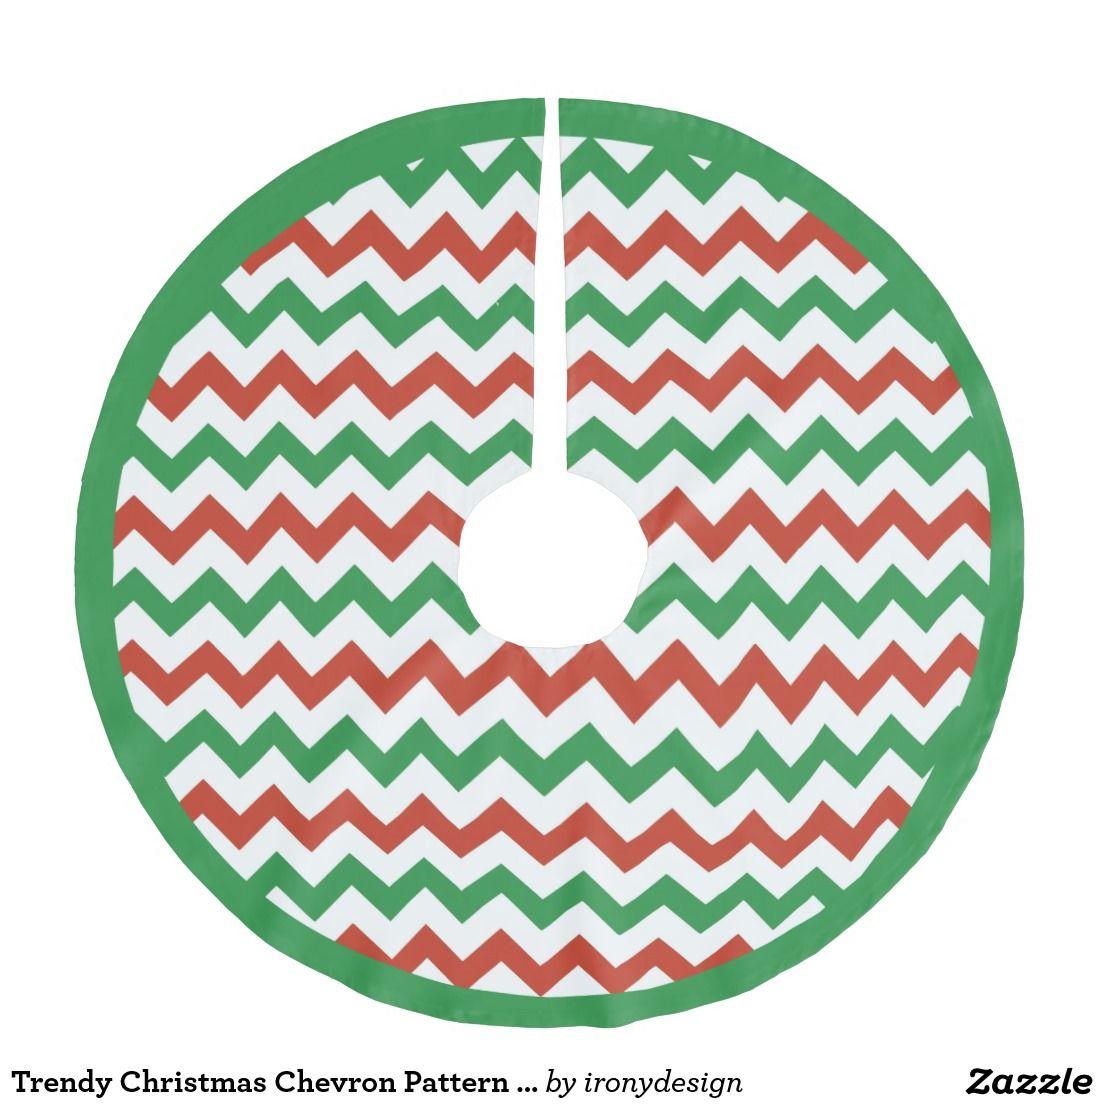 Trendy Christmas Chevron Pattern Green Trim Brushed Polyester Tree Skirt